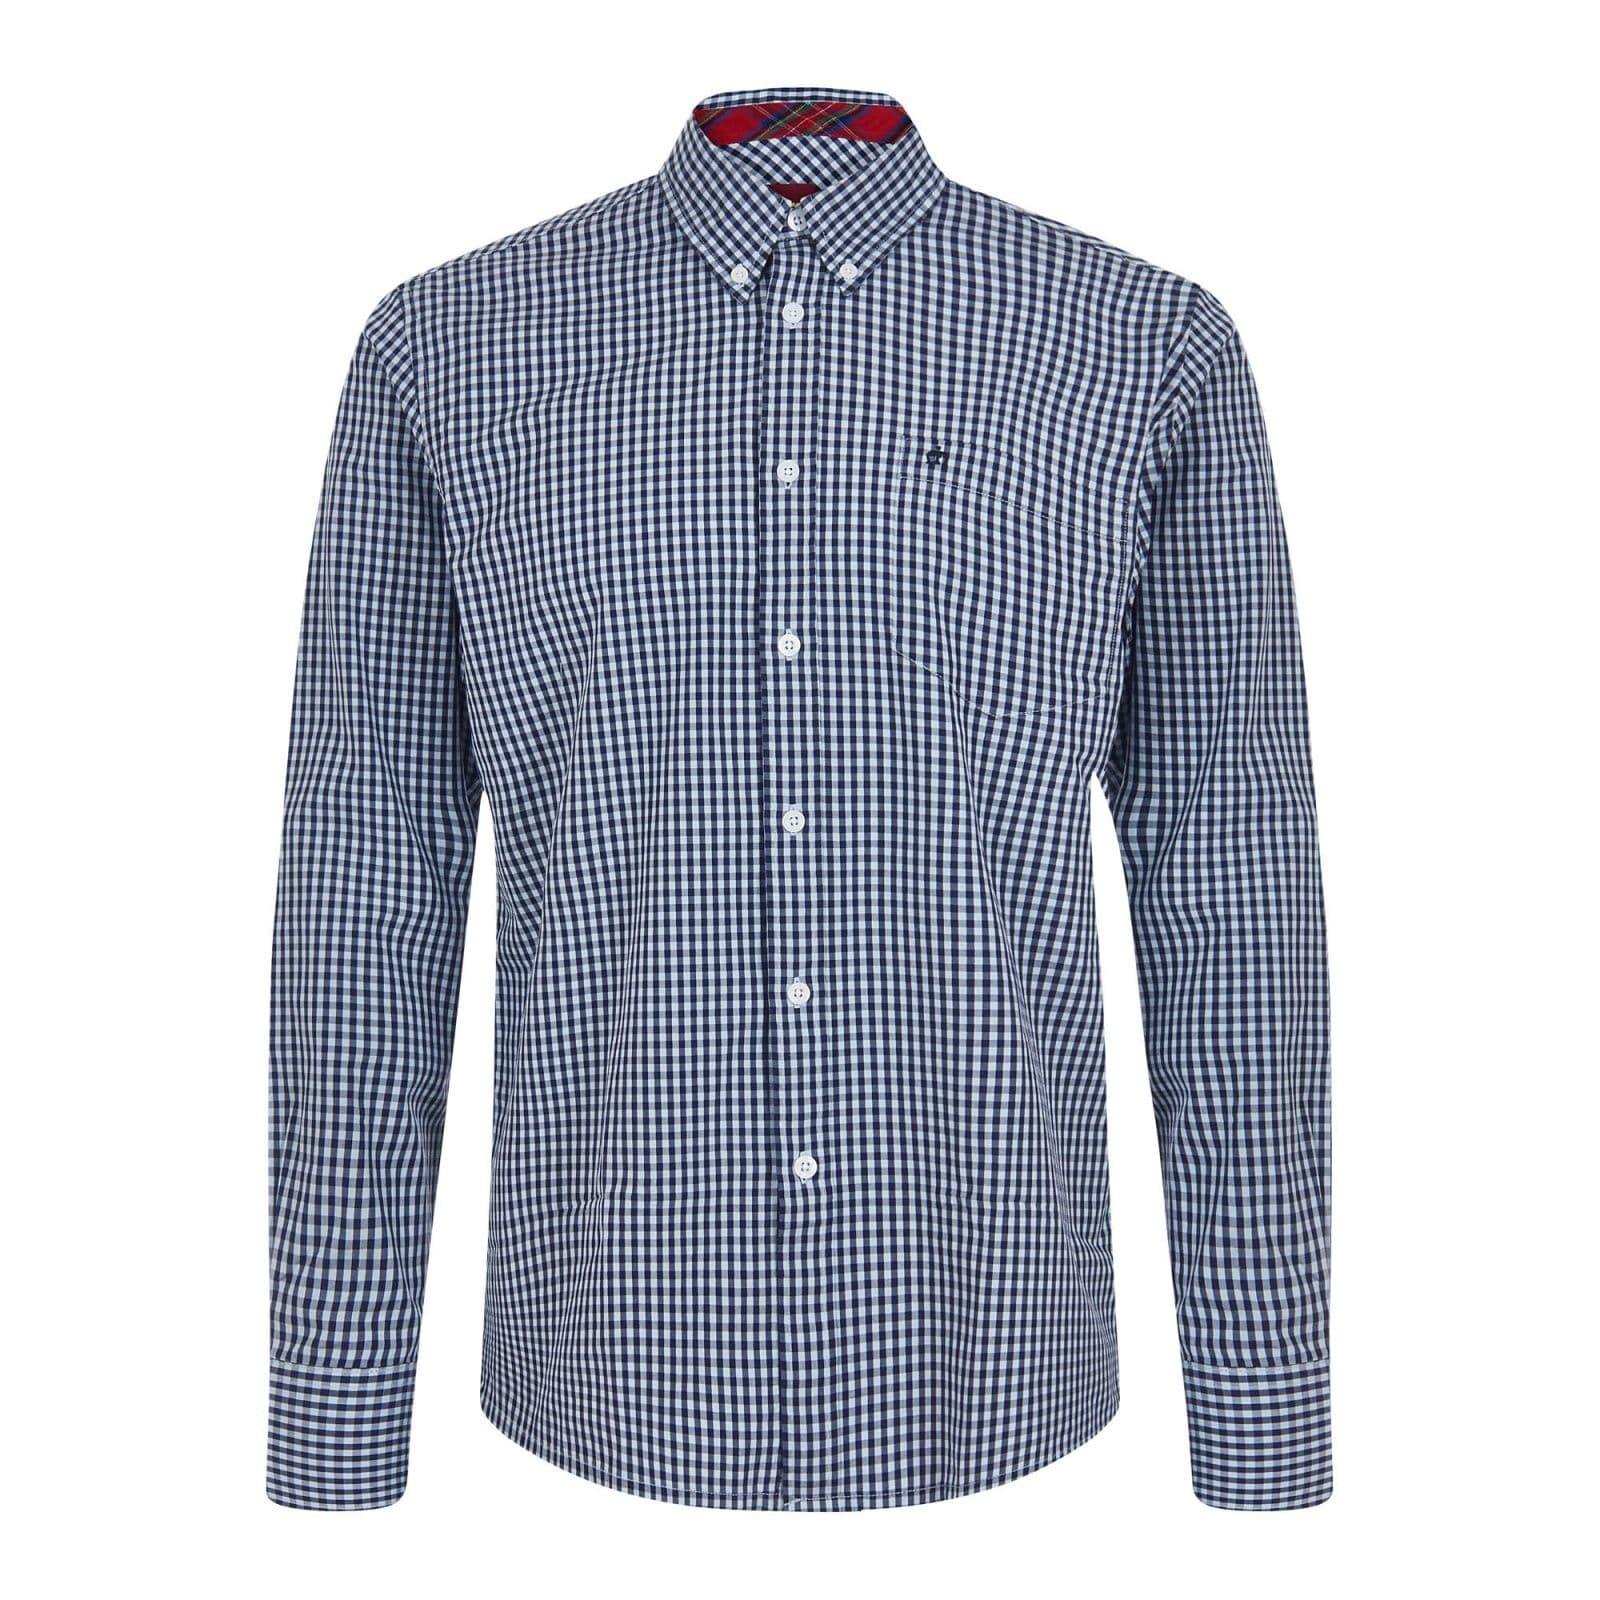 Рубашка JapsterРубашки под заказ<br><br><br>Артикул: 1506215<br>Материал: 100% хлопок<br>Цвет: сине-голубая клетка<br>Пол: Мужской